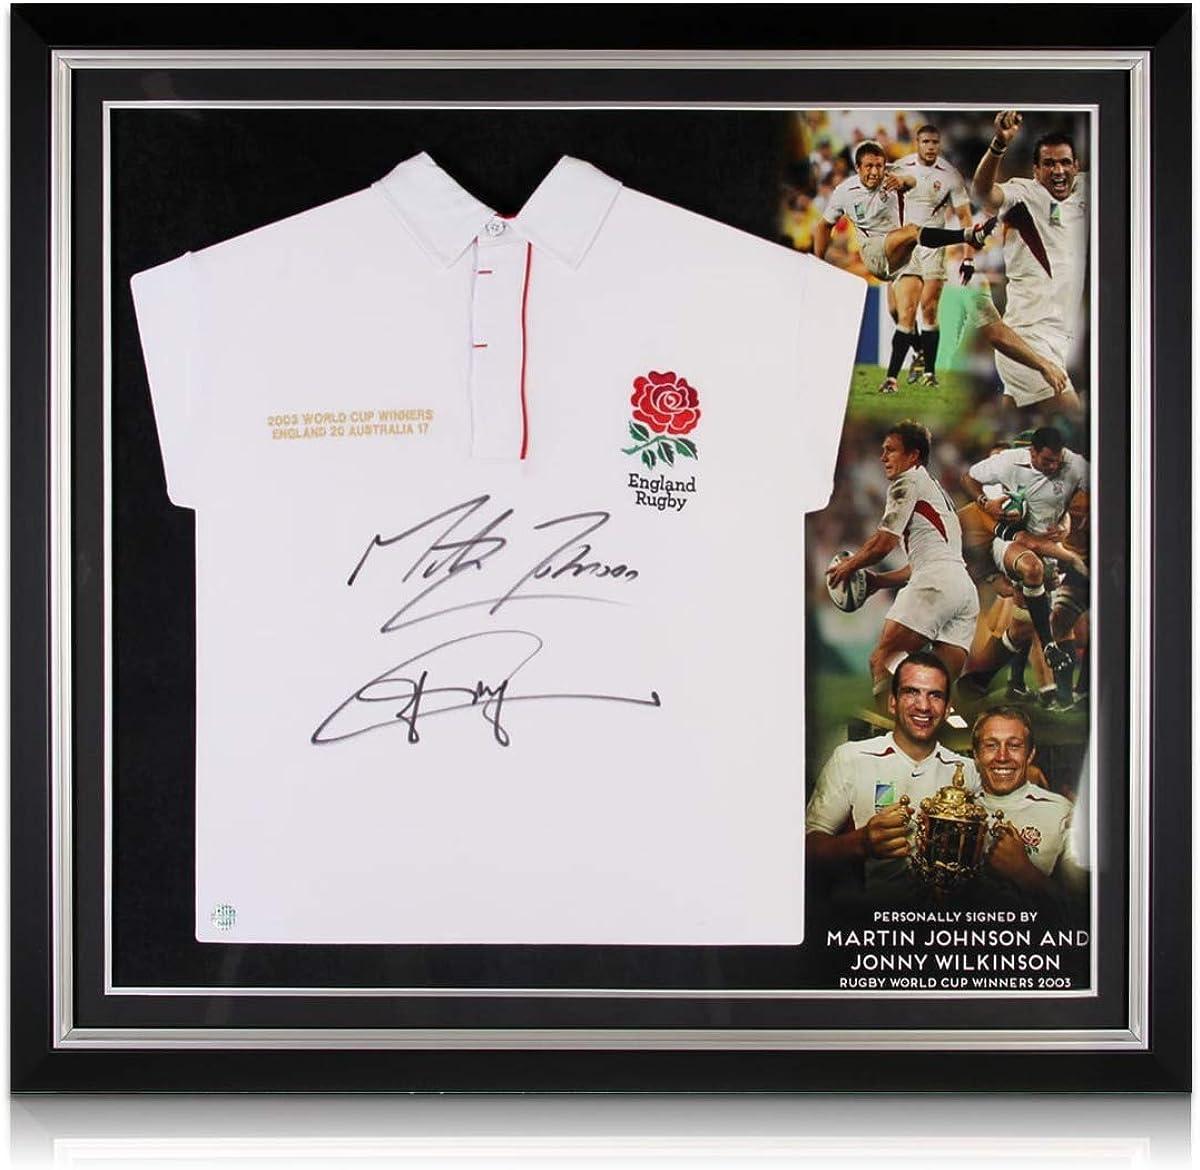 Premium Frame Exclusive Memorabilia Jonny Wilkinson And Martin Johnson Signed England Rugby Shirt